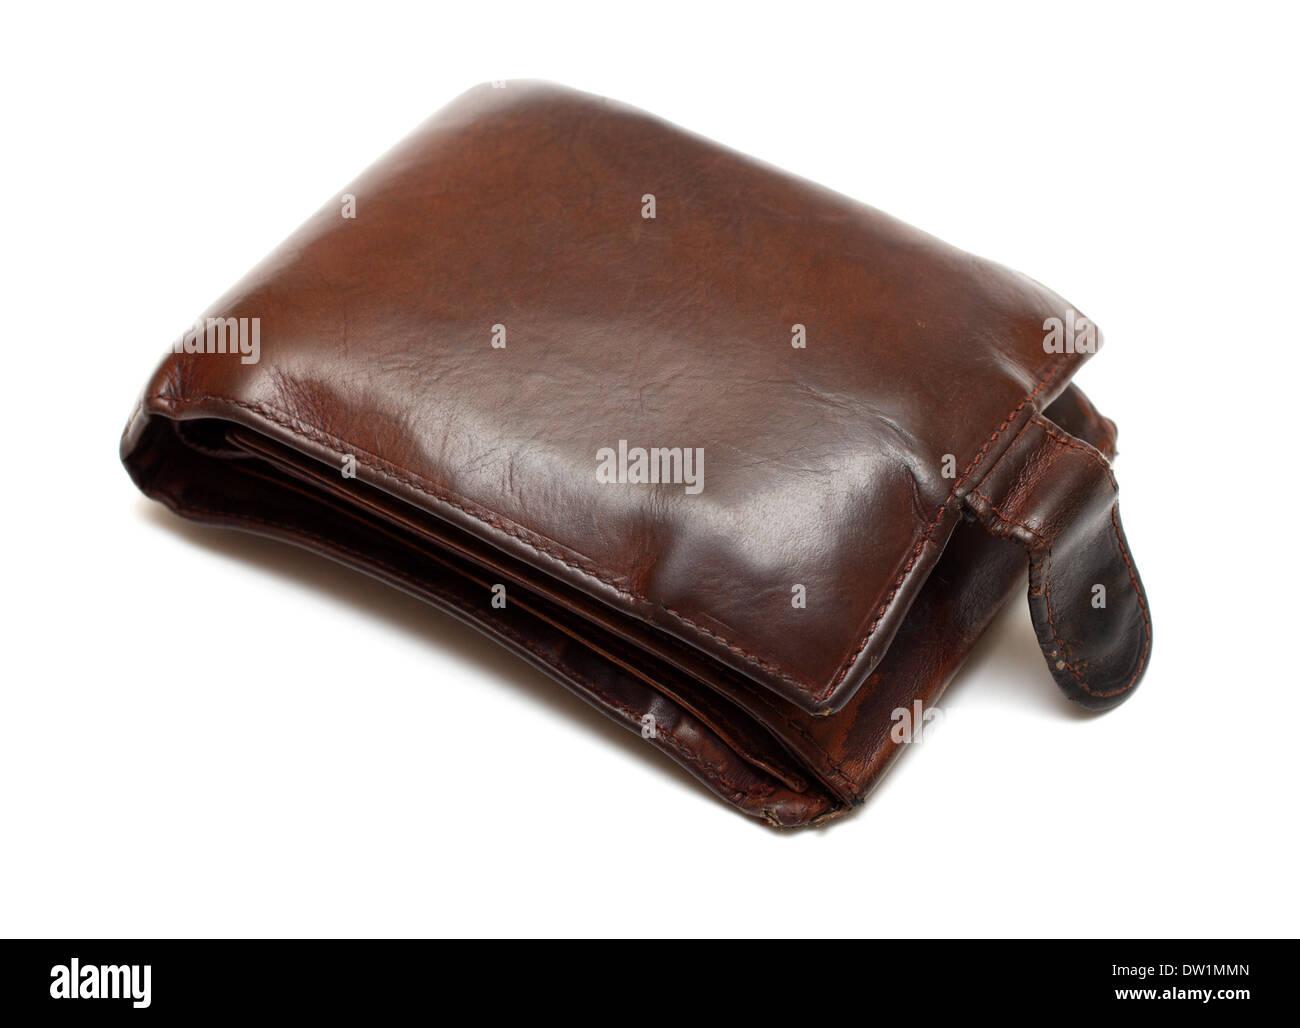 prall gefüllte Geldbörse braun Leder Stockfoto